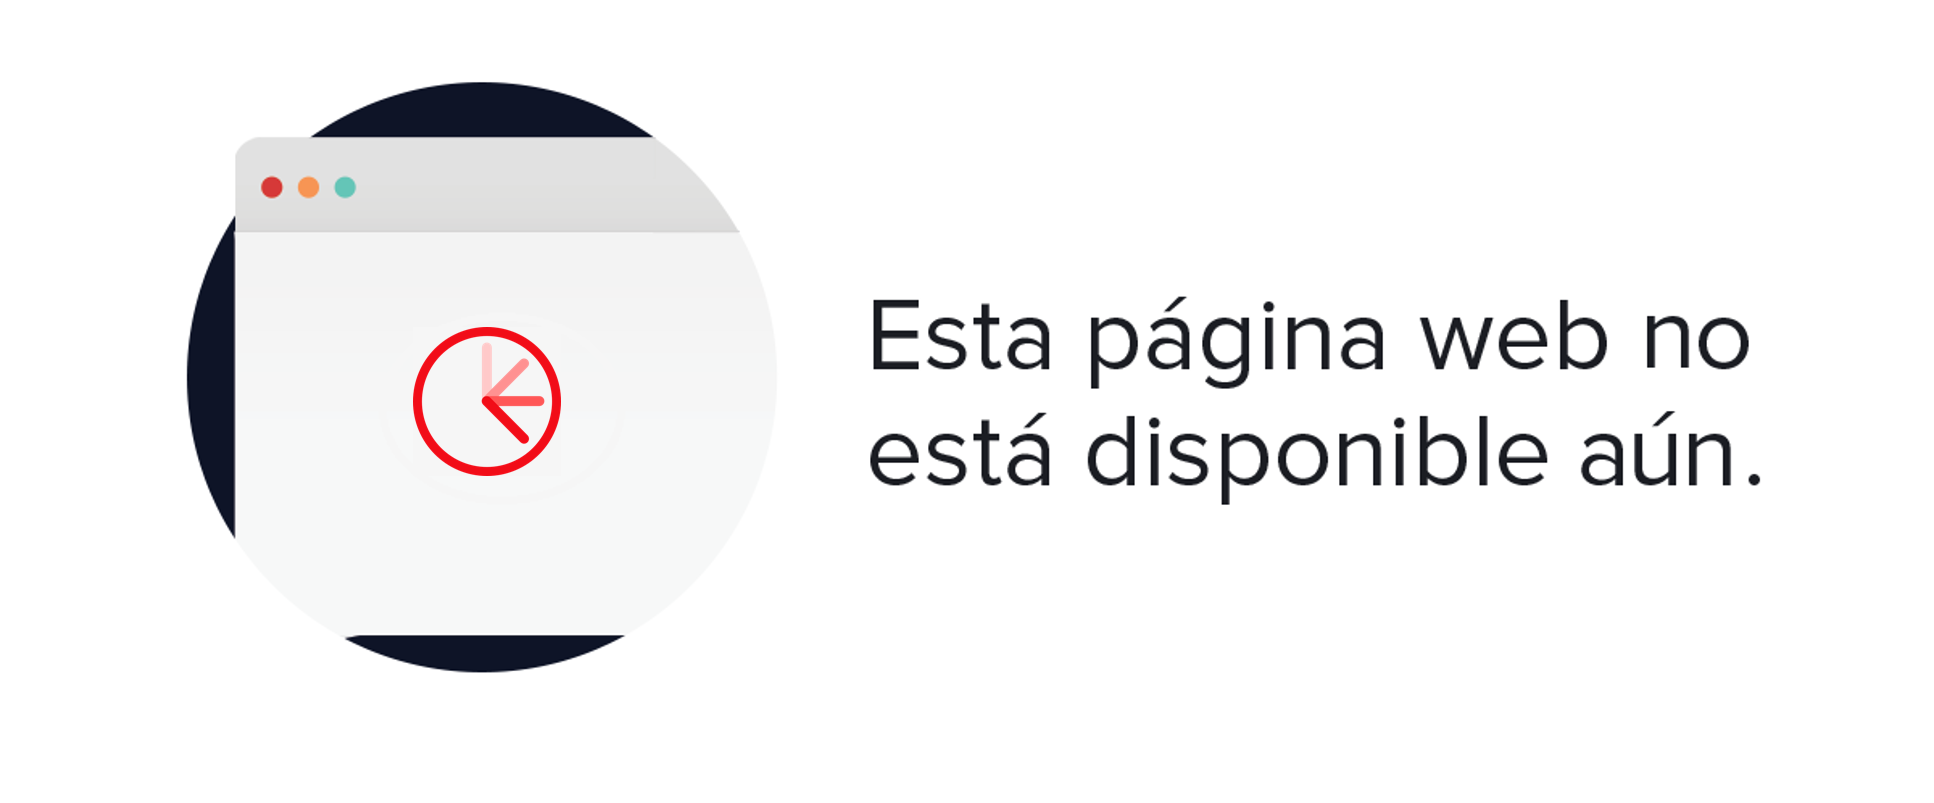 Jocavi - Pantalón fuseau de mujer Jocavi en color negro Negro 001015760300911038 - MLFAIZN